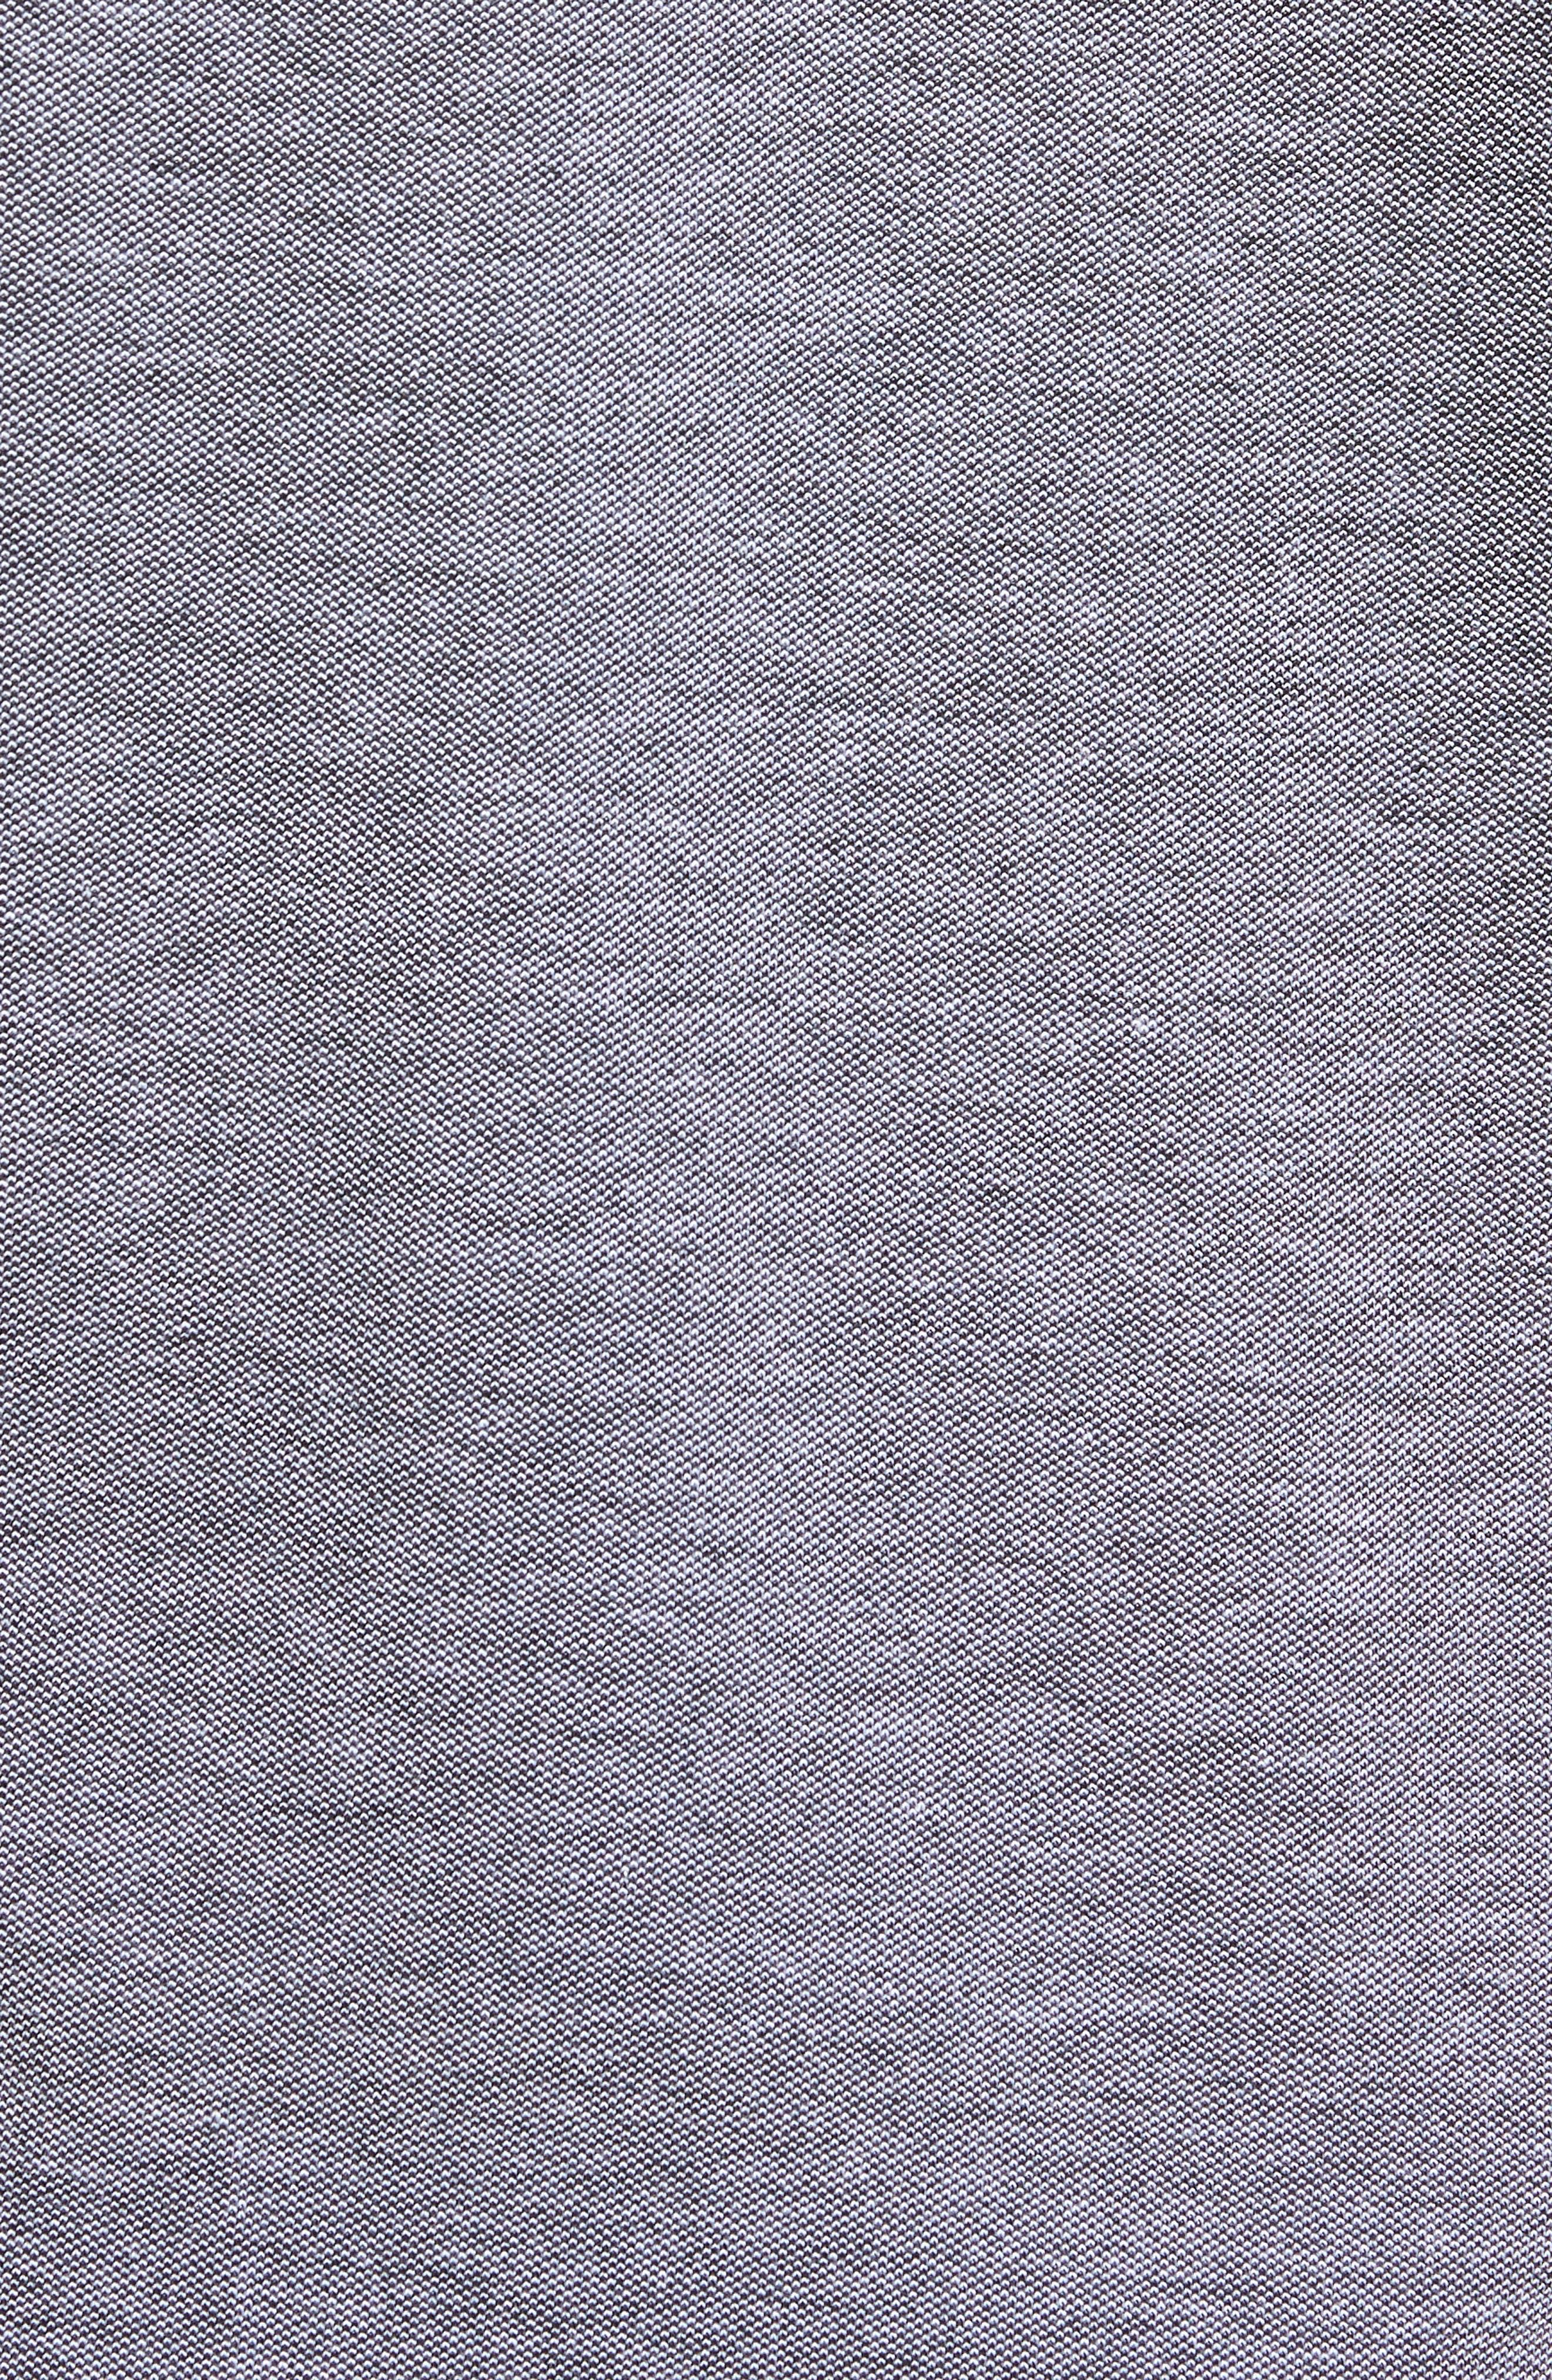 TIlson Regular Fit T-Shirt,                             Alternate thumbnail 5, color,                             BLACK